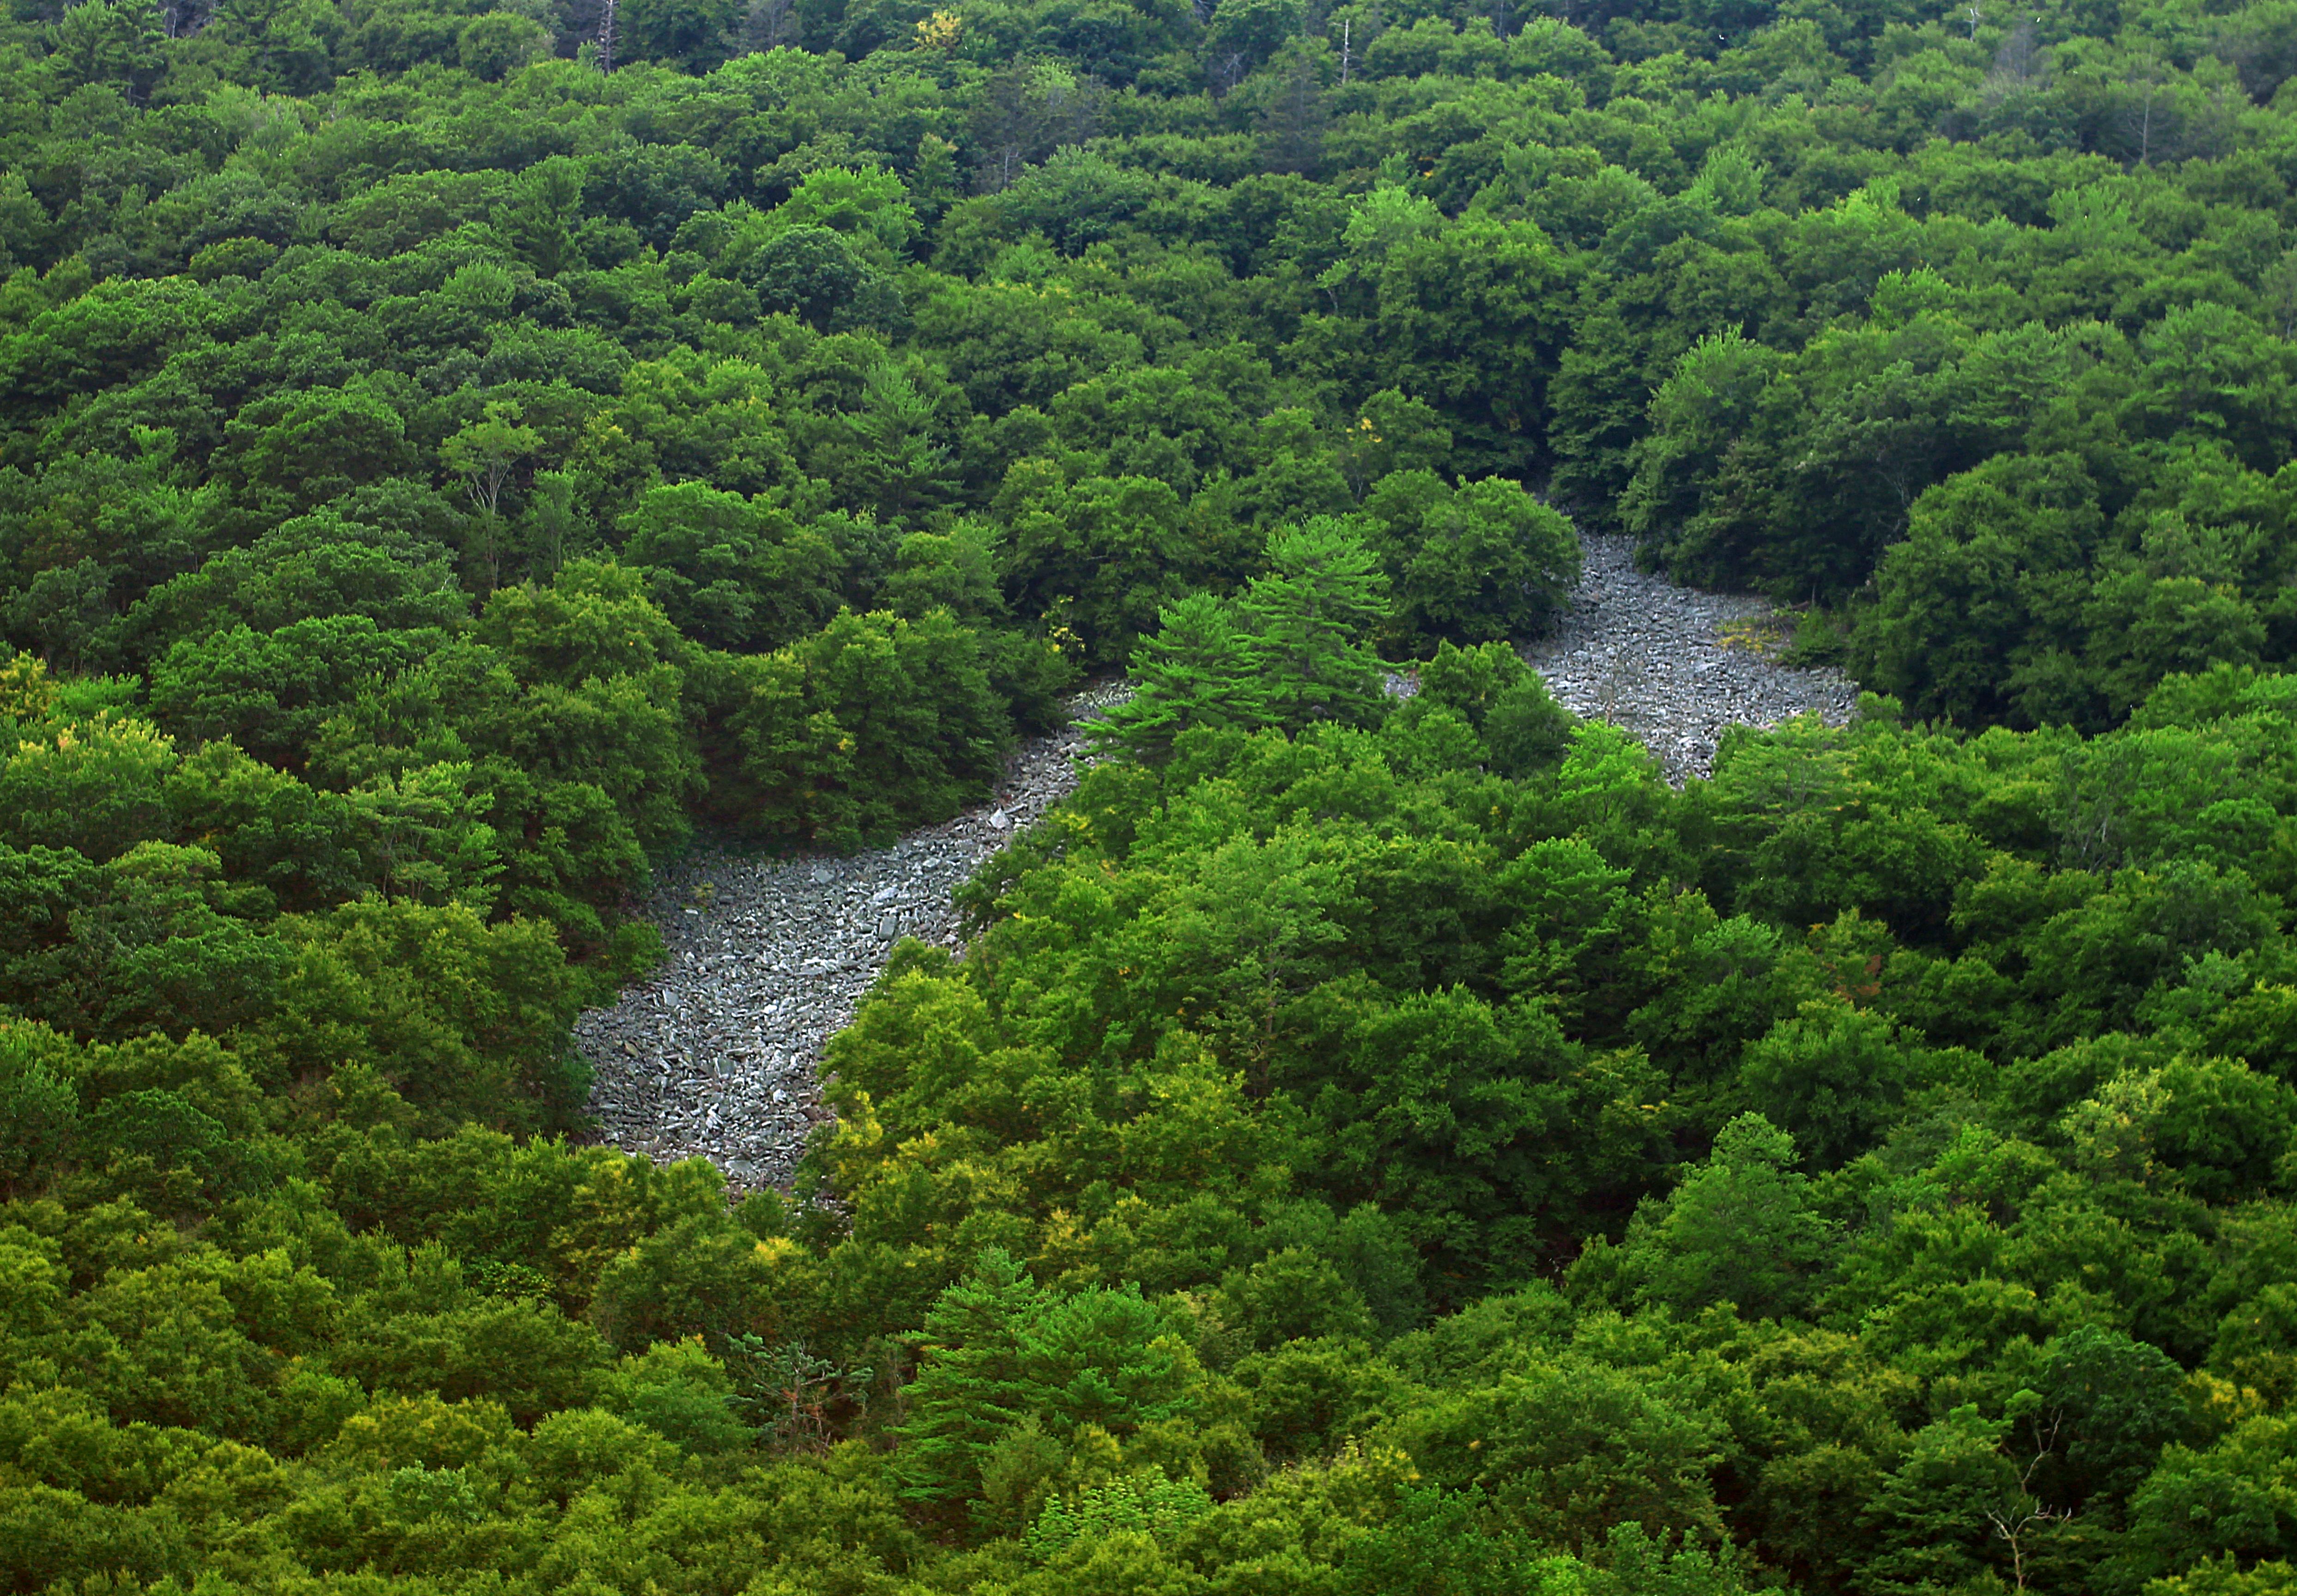 Planter Dans Un Talus free images : tree, wilderness, mountain, hiking, river